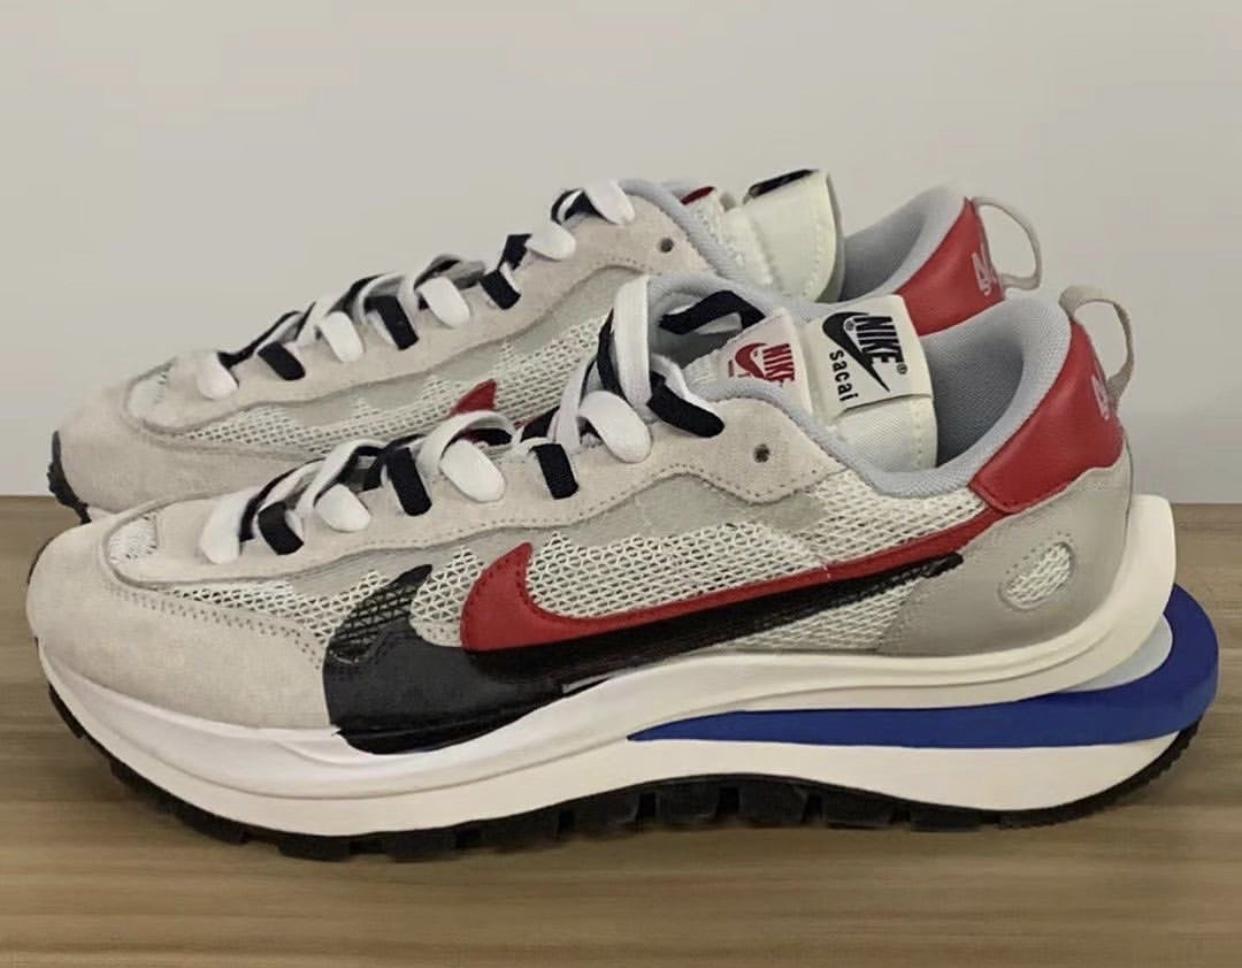 Sacai Nike VaporWaffle Sail Game Royal Sport Fuchsia CV1363-100 Release Date